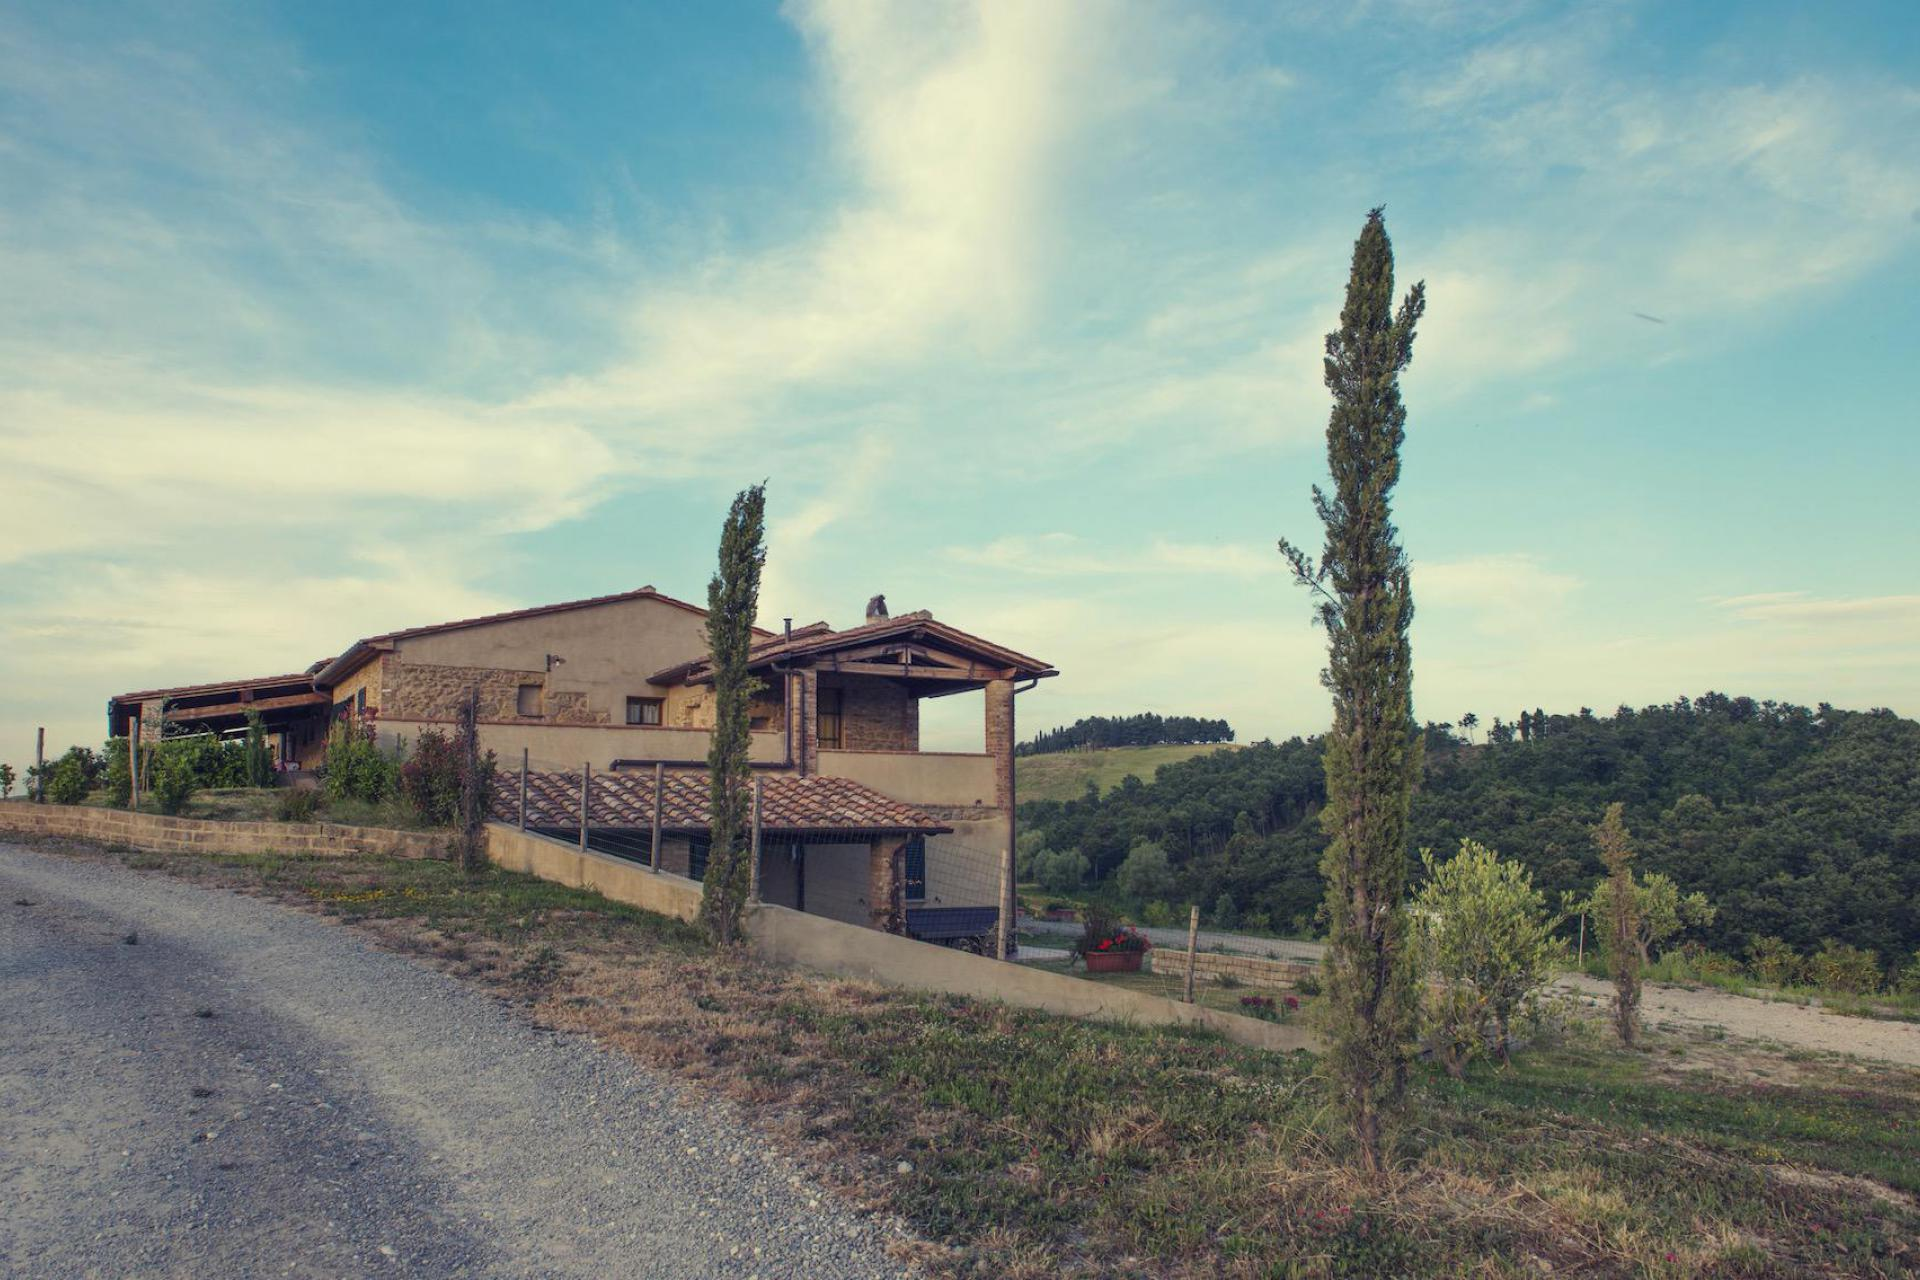 Agriturismo Toskana Wohnungen in Landhäusern Toskana - kinderfreundlich | myitalyselection.de